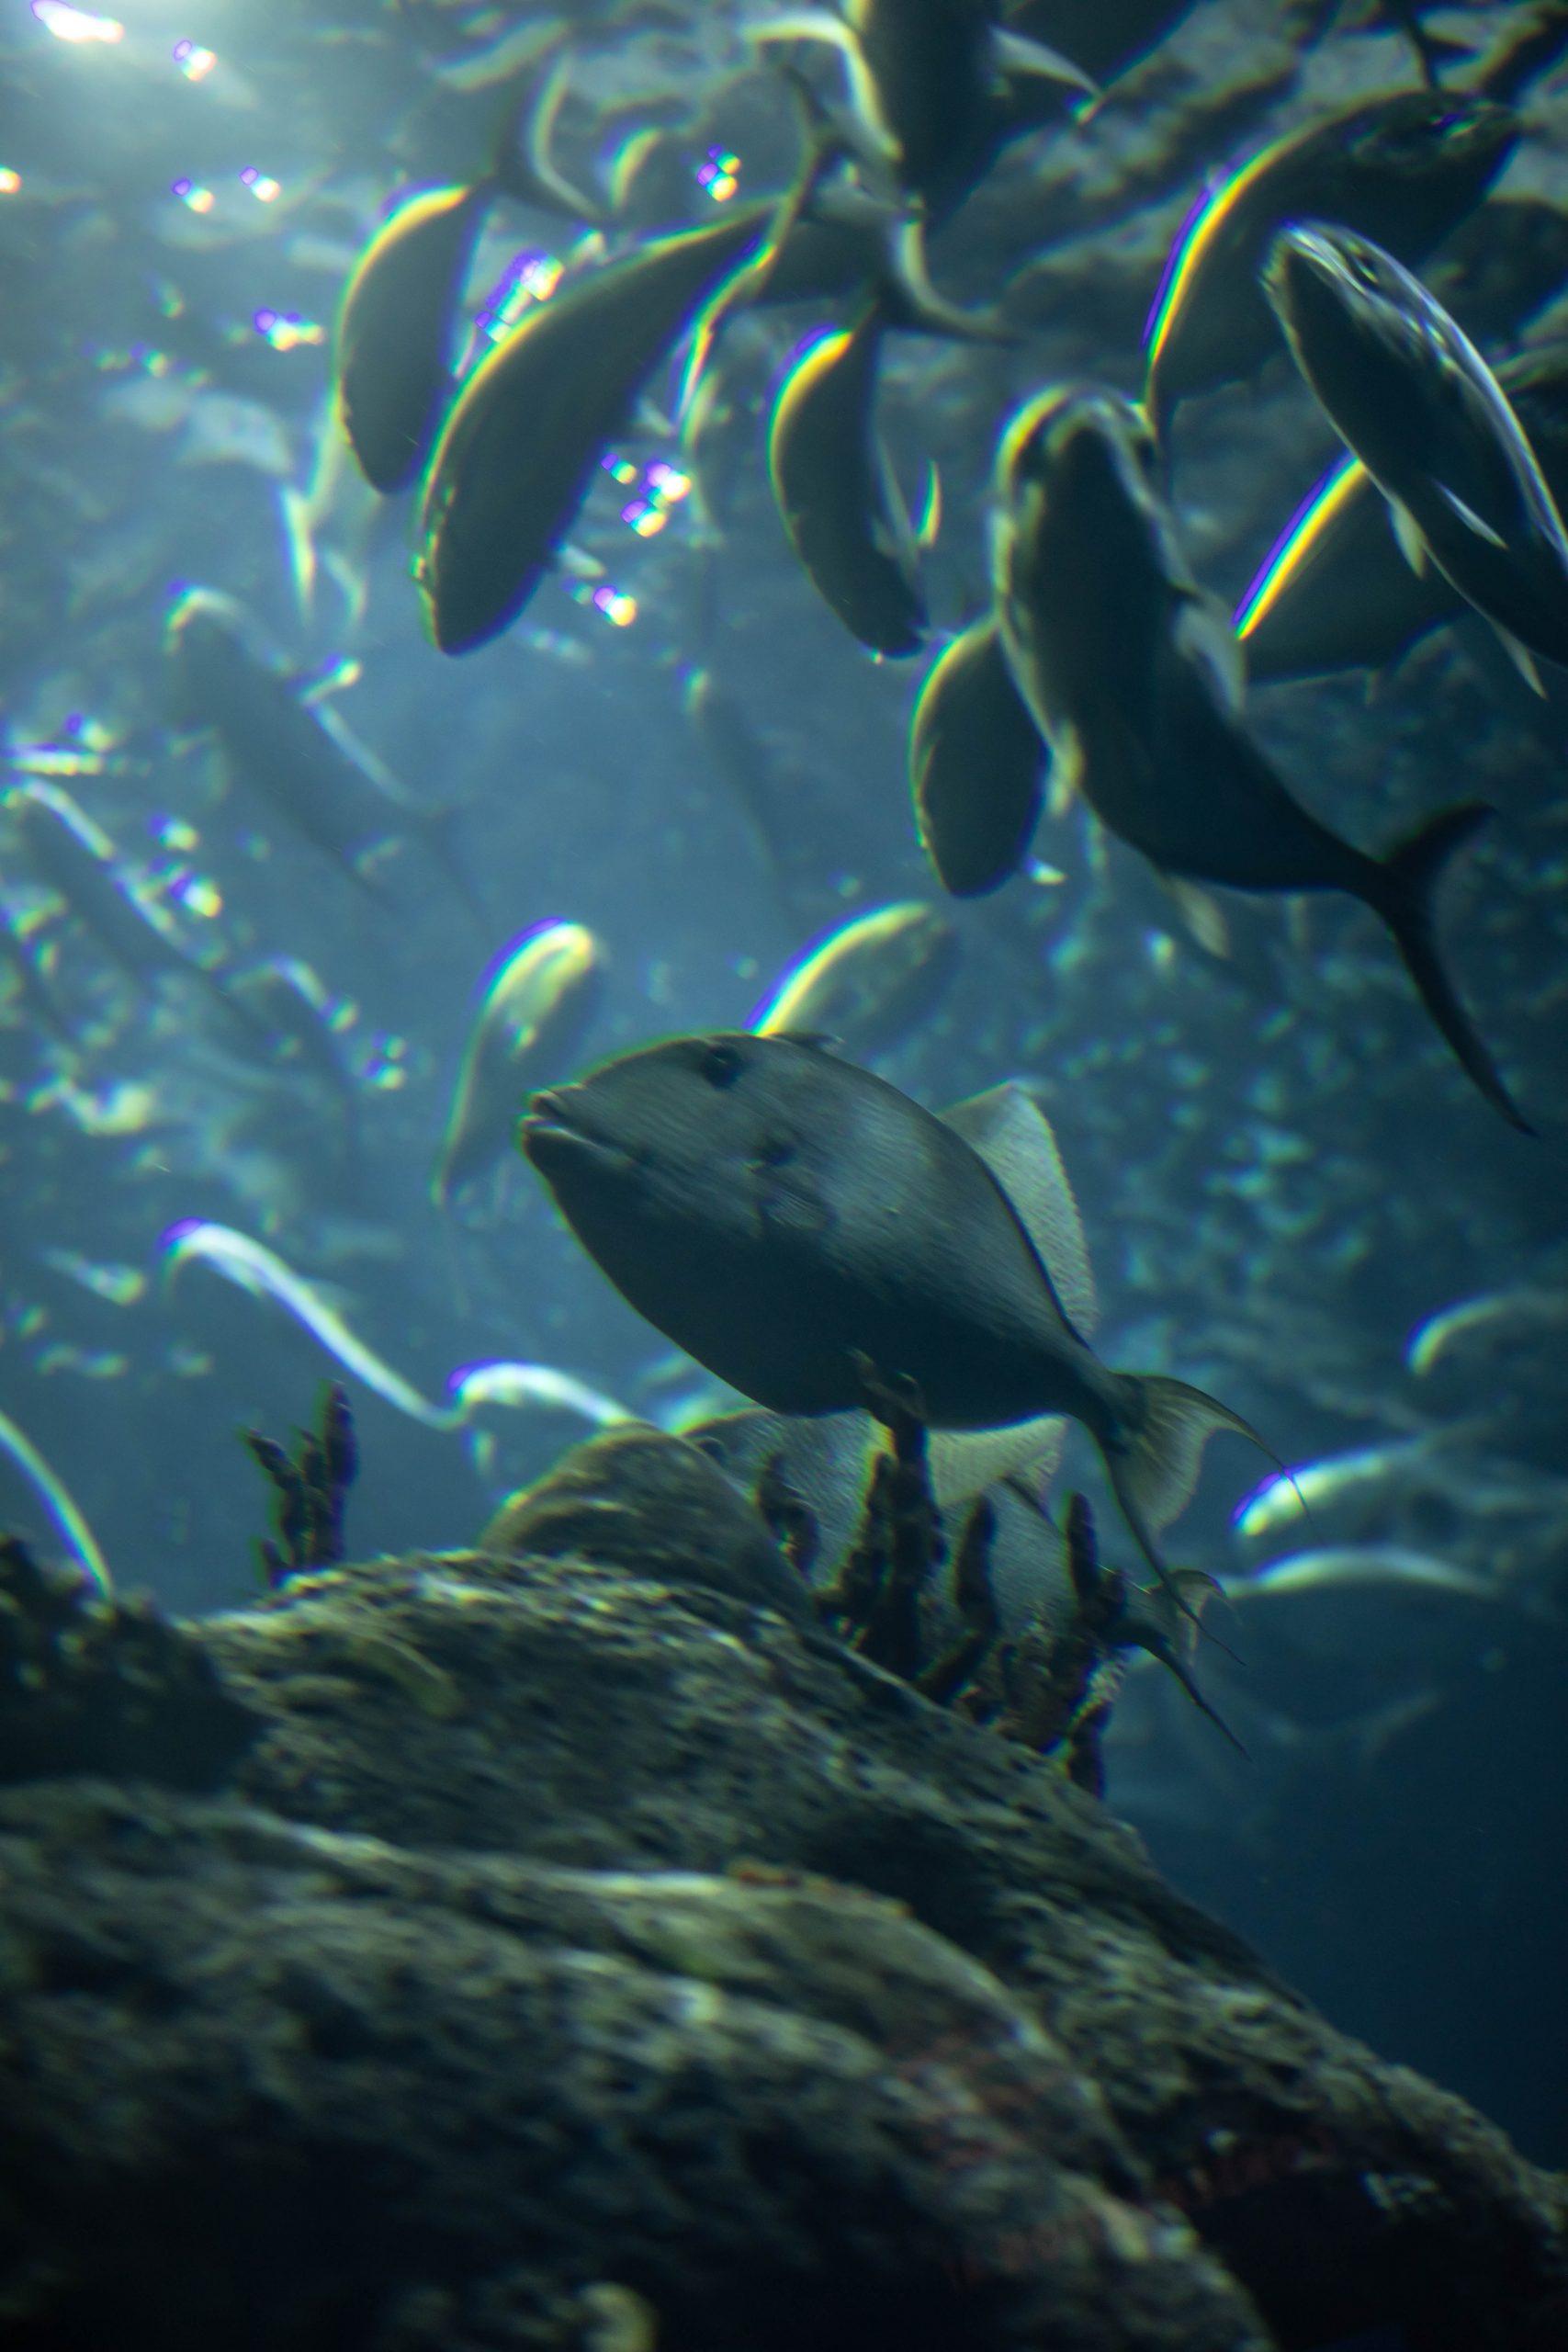 Fish at The South Carolina Aquarium & Sea Turtle Care Center Photographed by Luxury Travel Writer Annie Fairfax